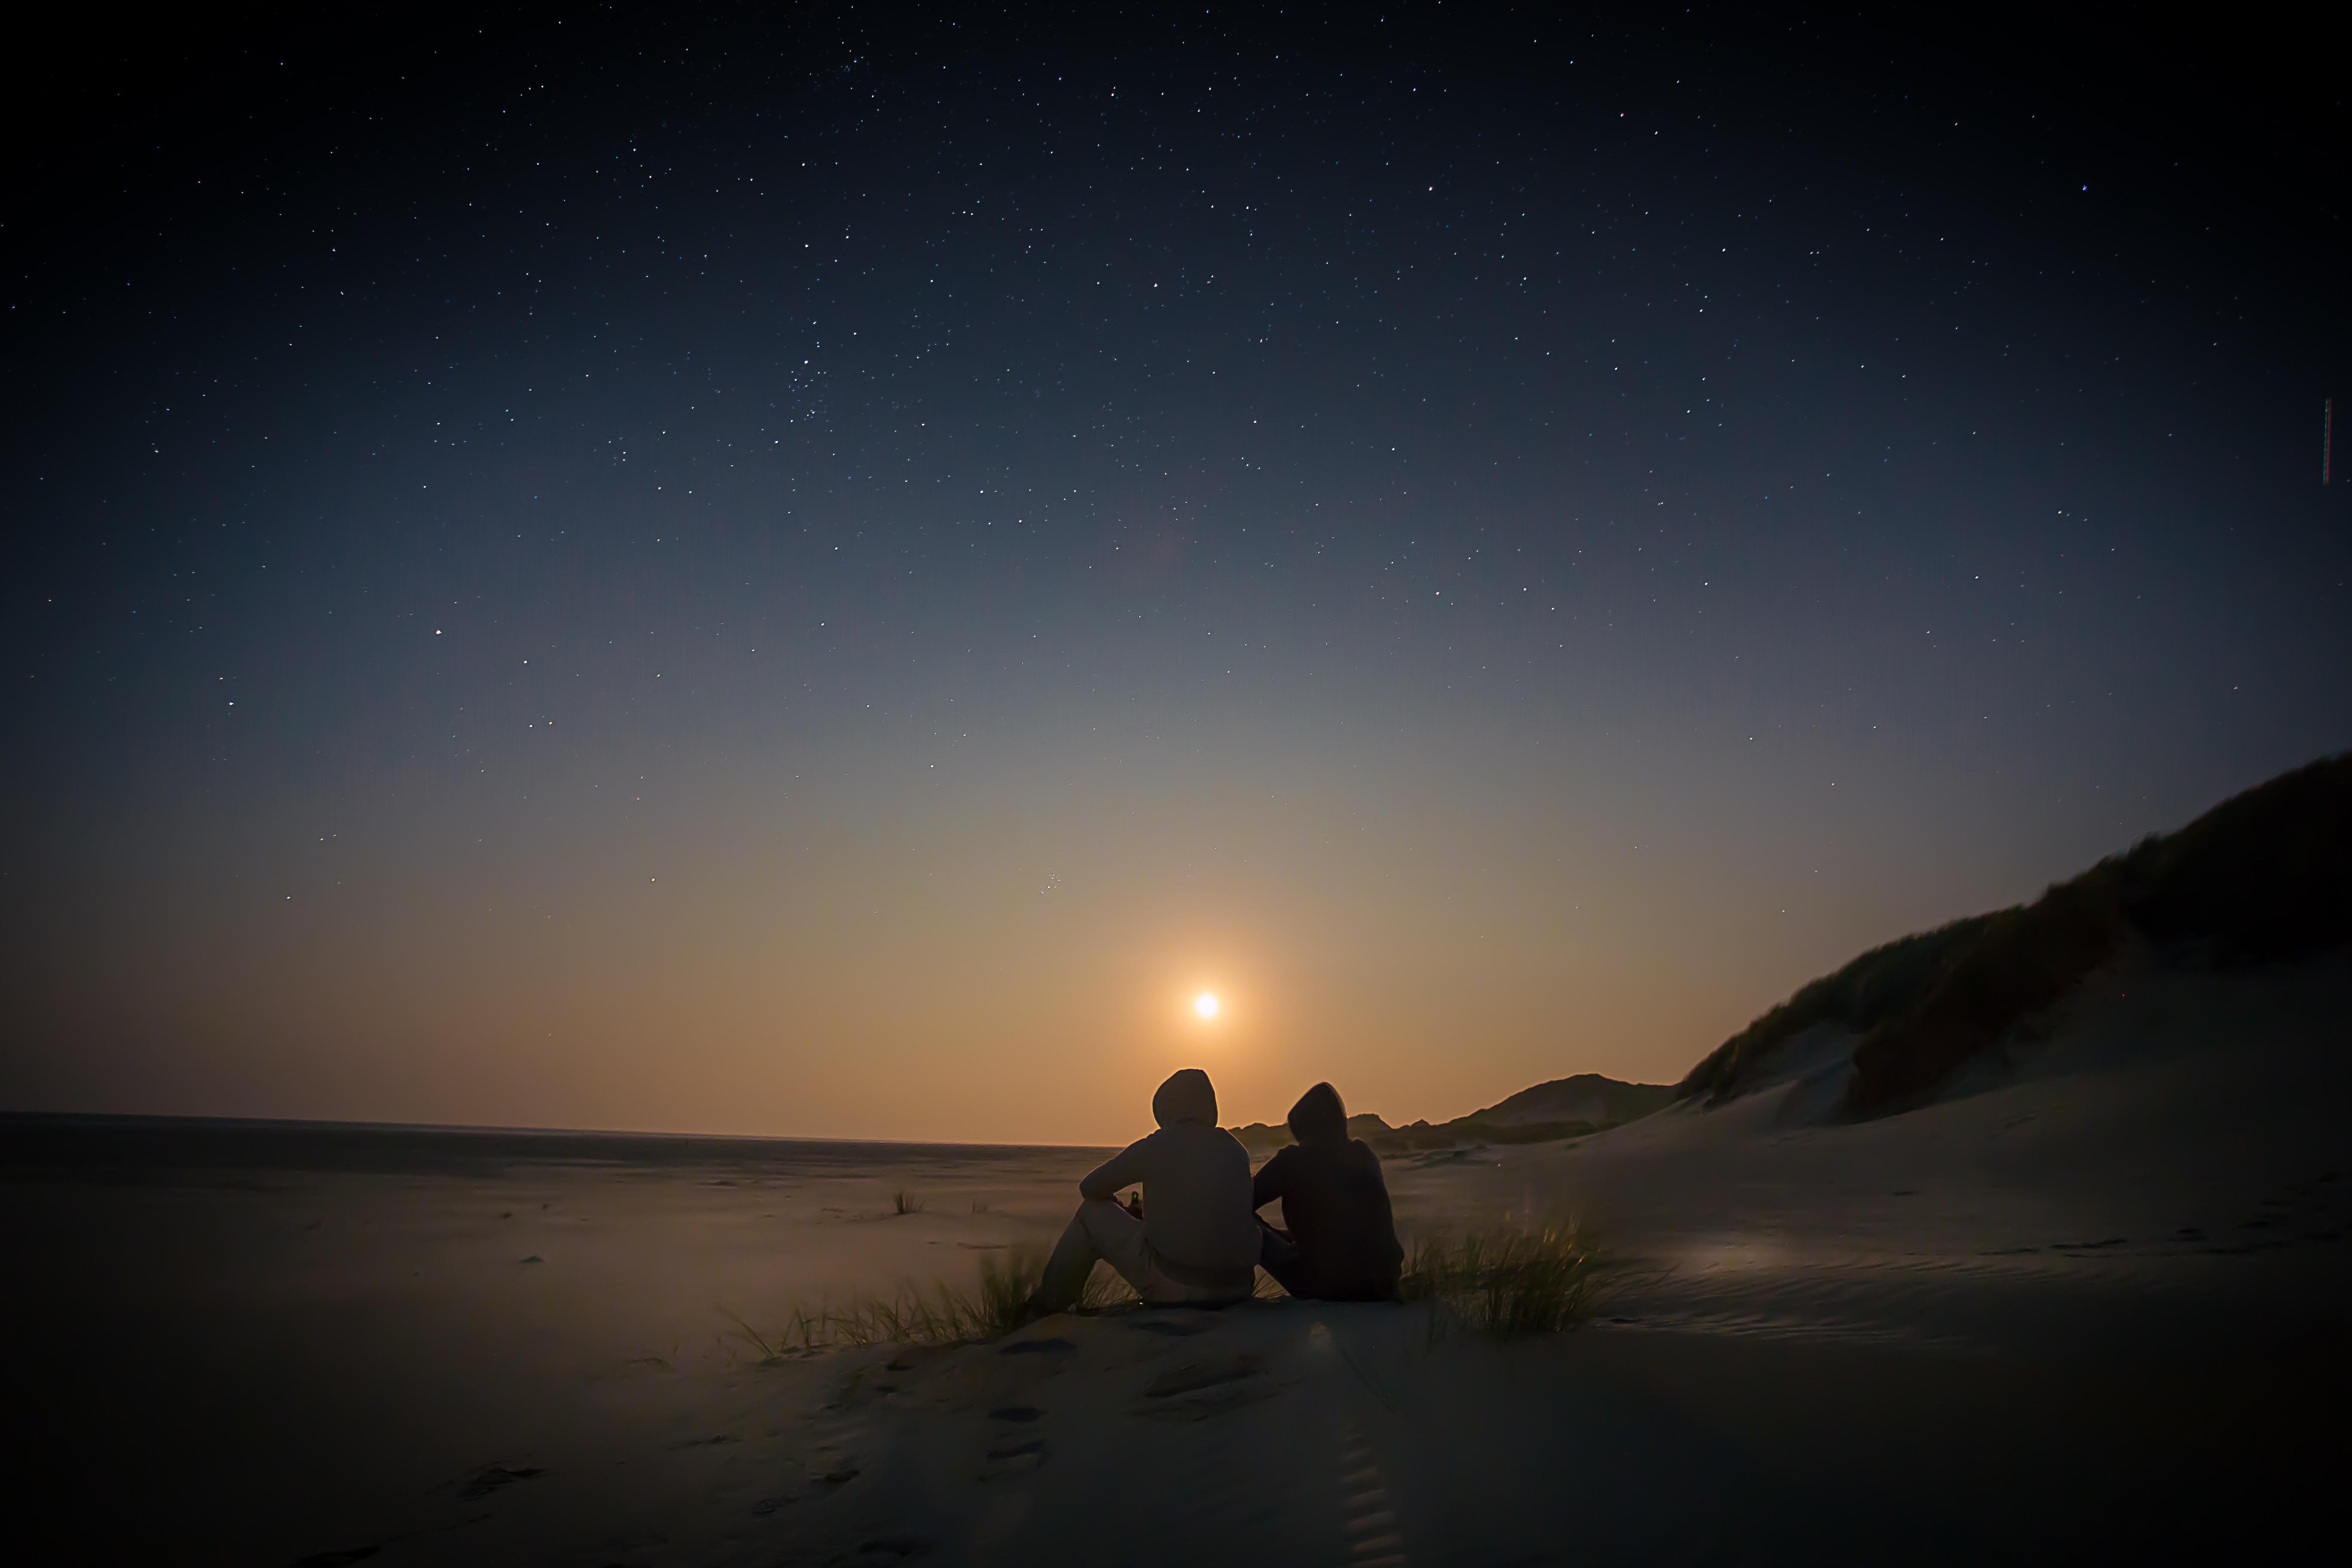 Free Images Beach Landscape Nature Sand Horizon Light Sun Sunset Sunlight Star Dawn Atmosphere Dusk Evening Reflection Space Darkness